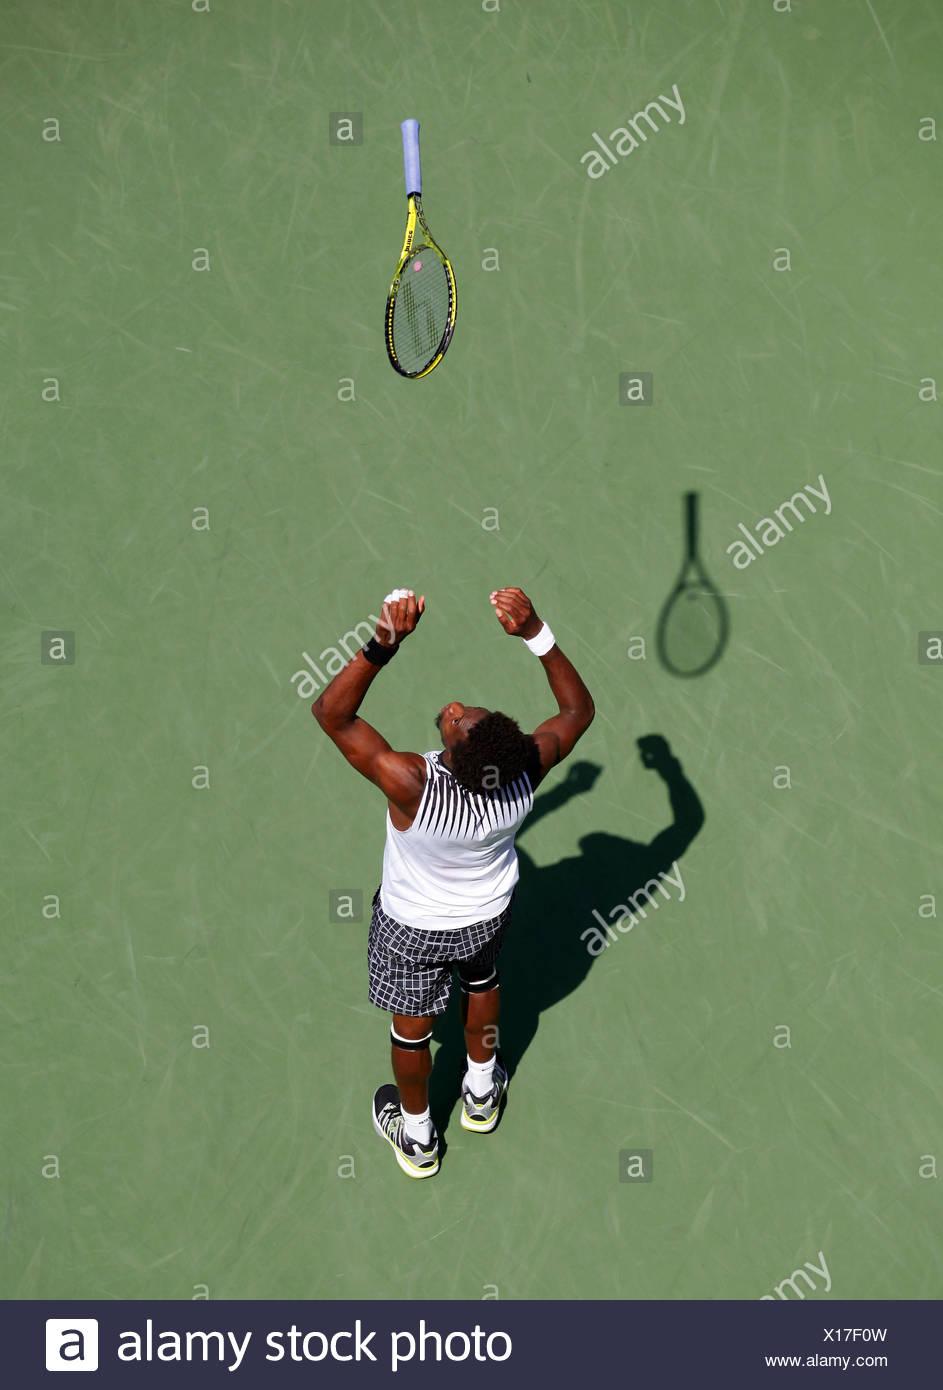 Gael Monfils, French tennis player, US Open 2010, ITF Grand Slam Tennis Tournament, USTA Billie Jean King National Tennis Center - Stock Image